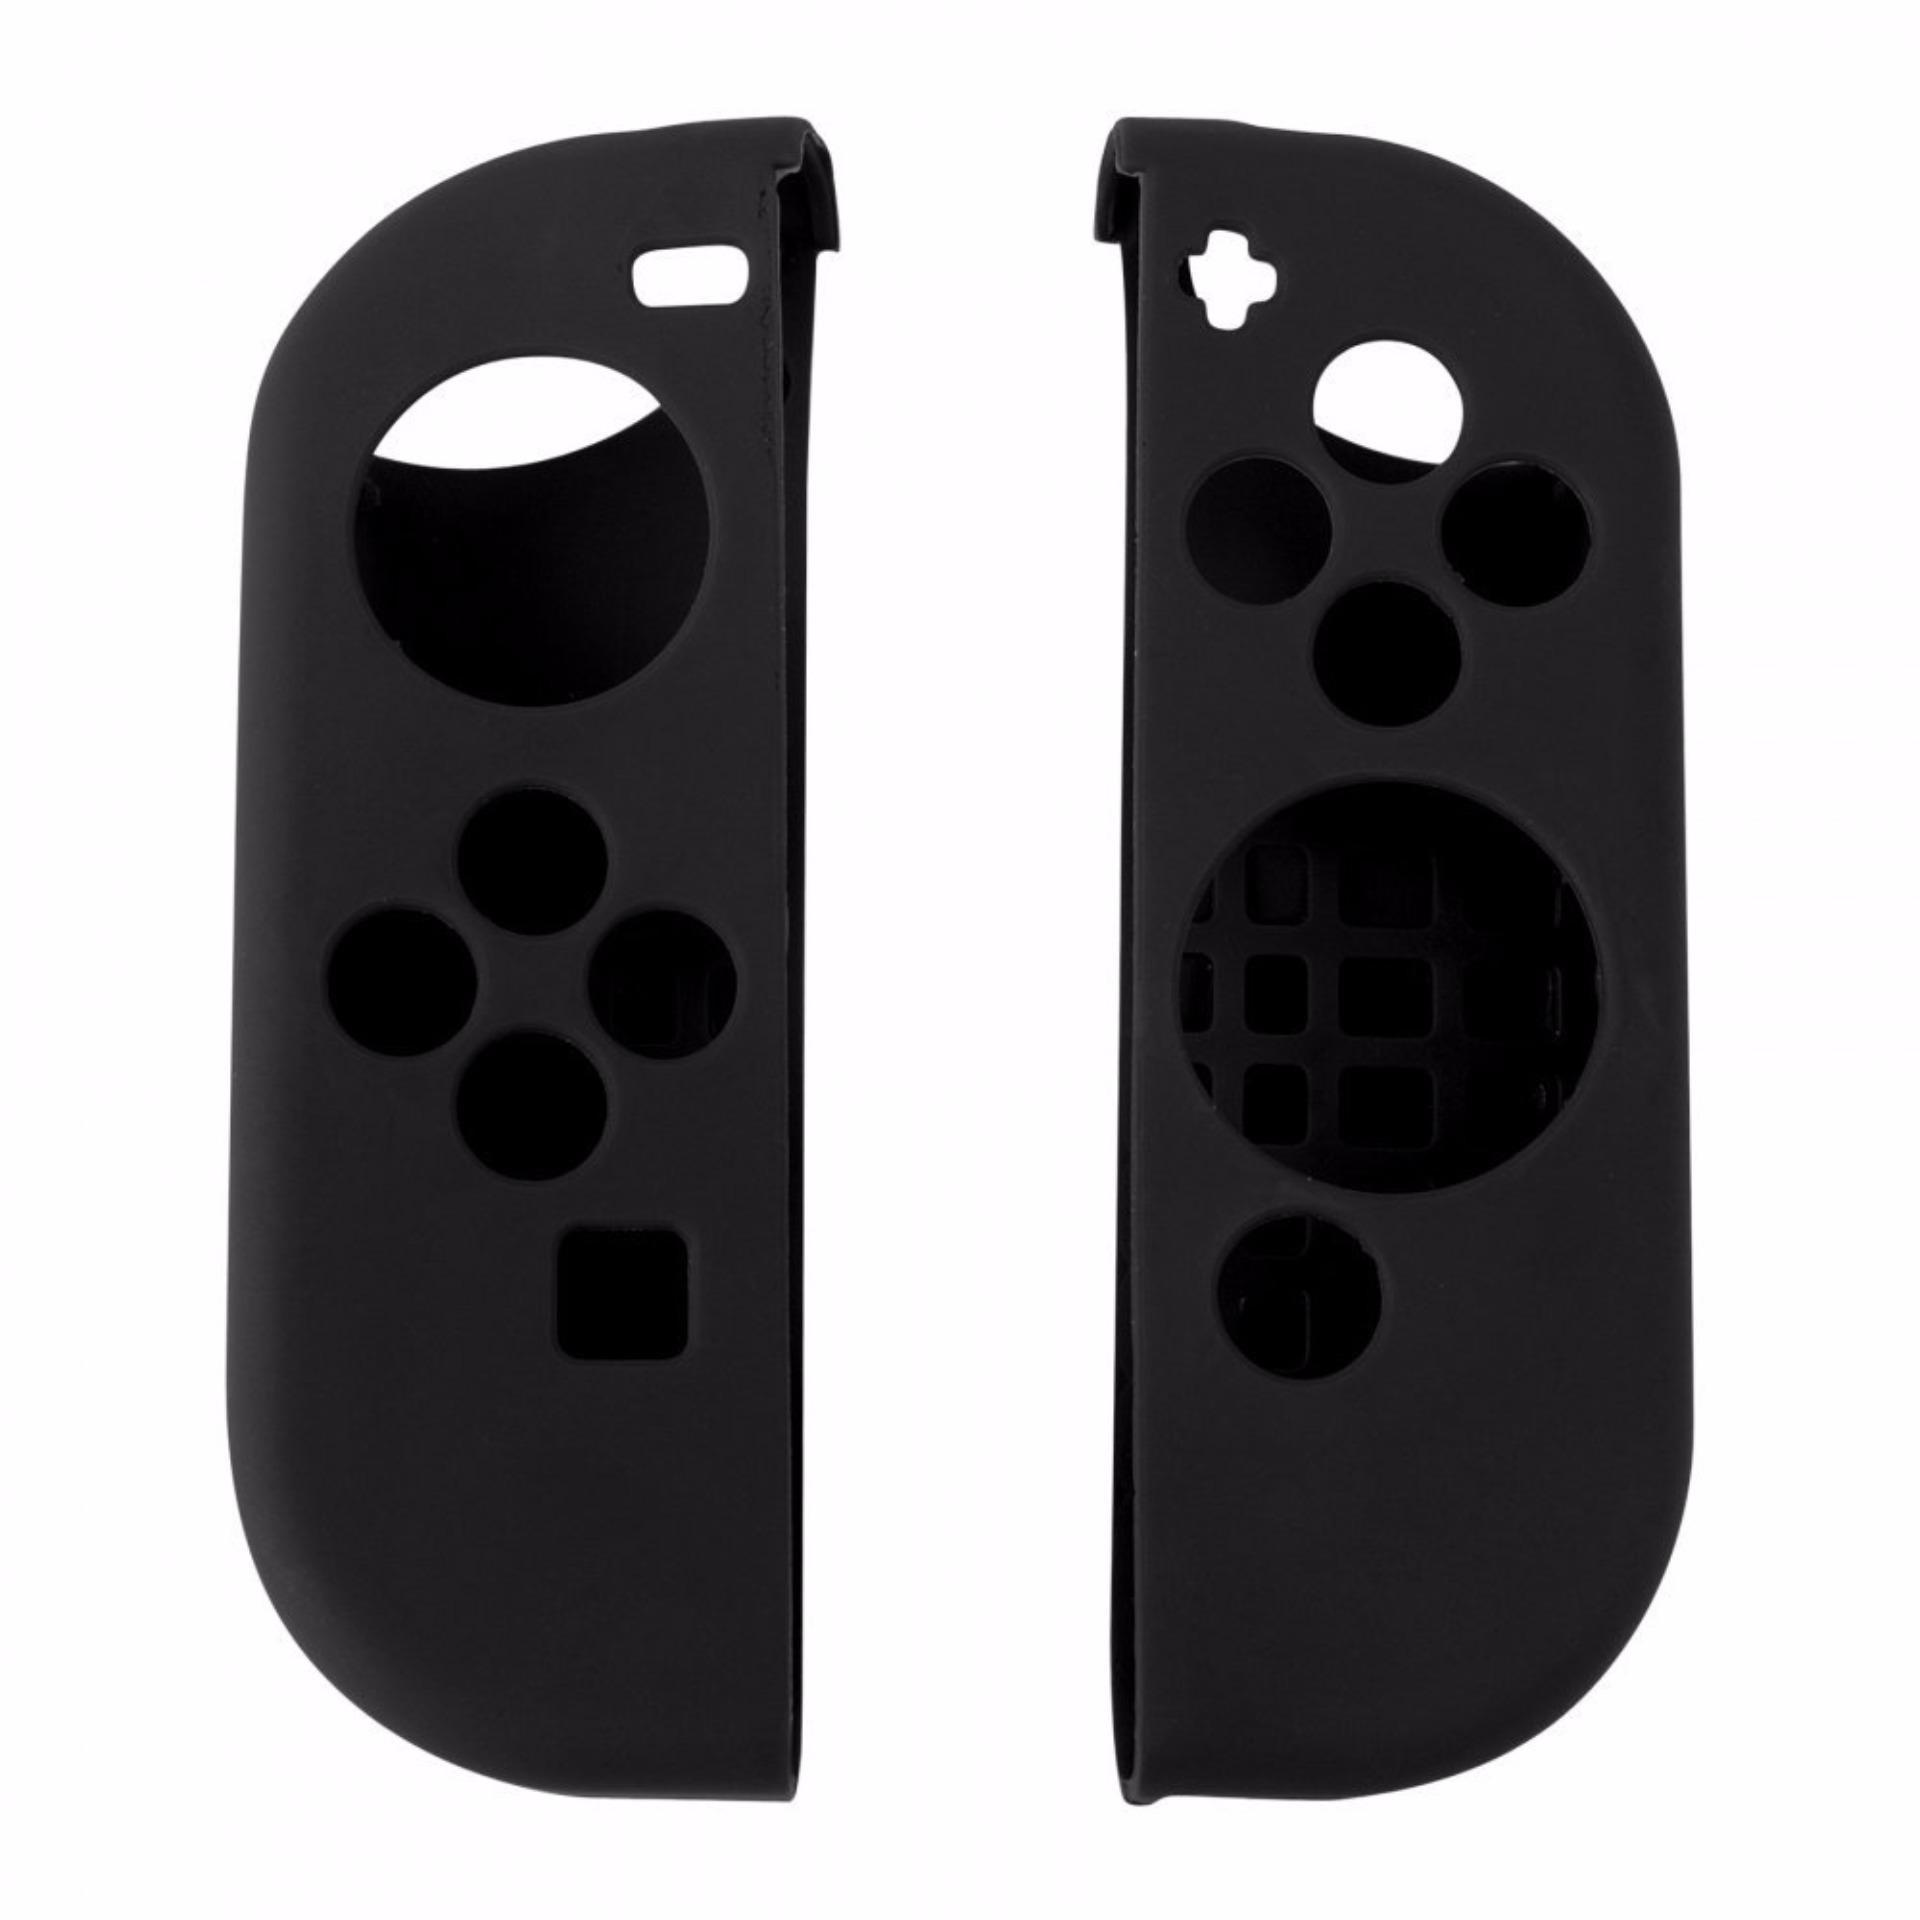 Nintendo Switch Joy-con Soft Gel Guards 1 Pair (Black)